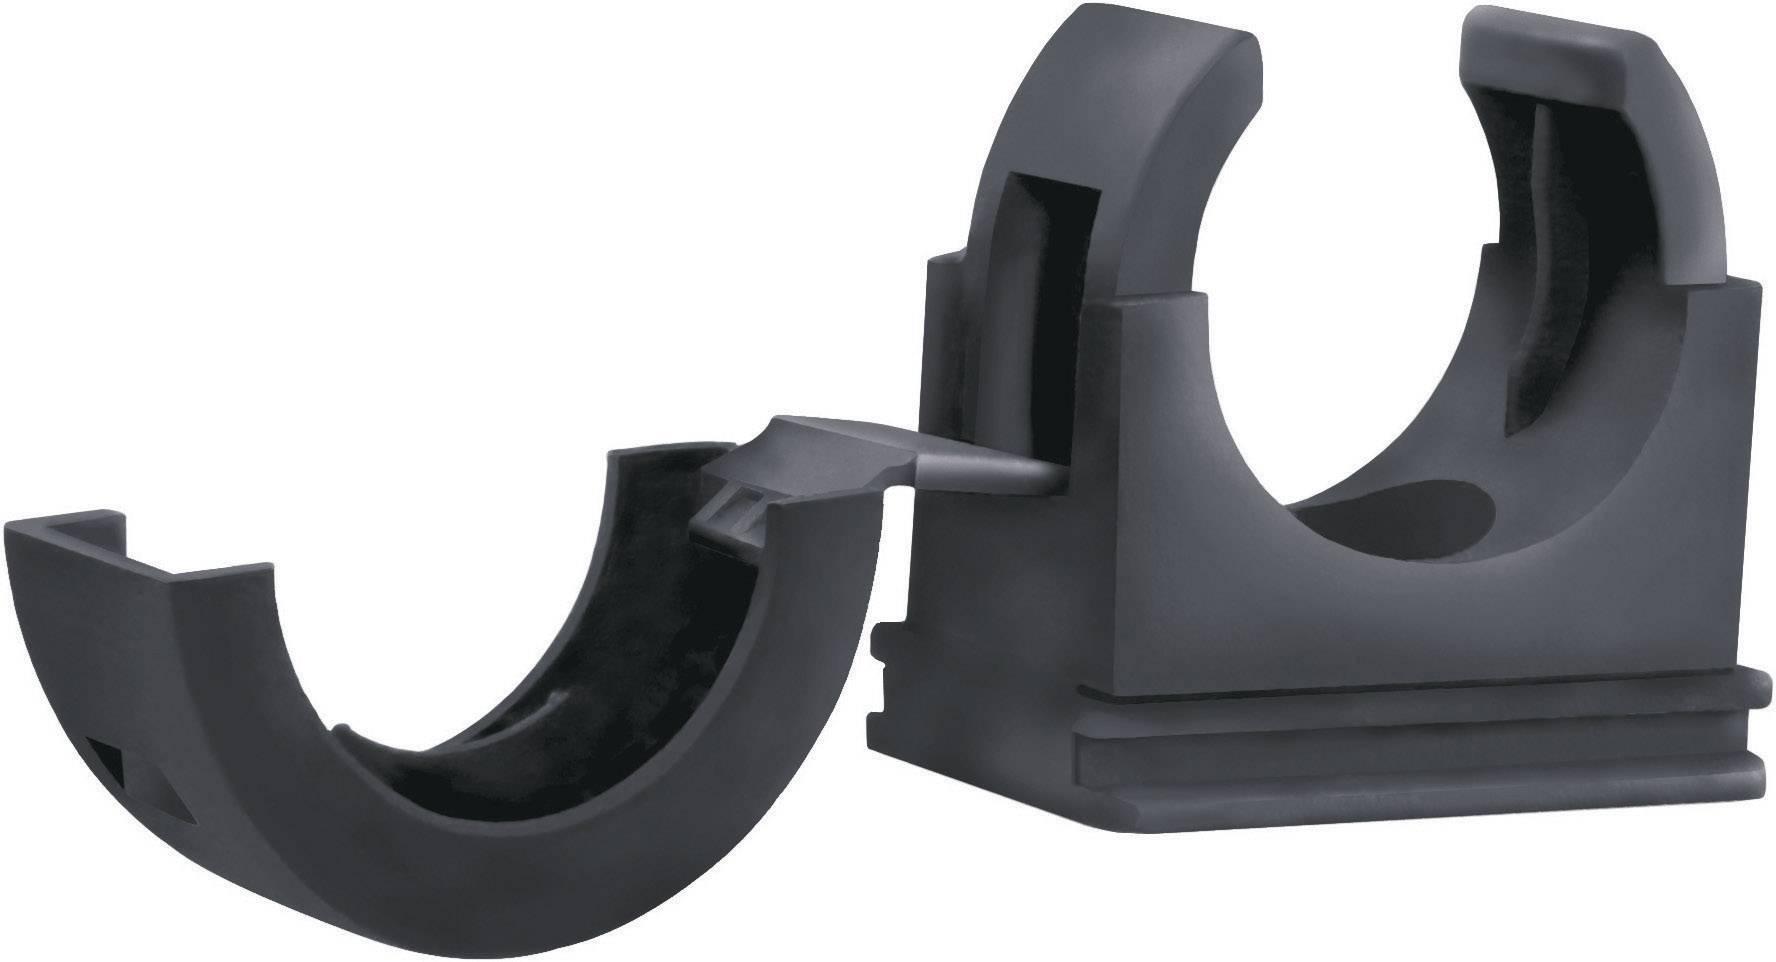 Držák hadice LAPP SILVYN® FCL 28 GY 55506940, 28.10 mm, šedá, 10 ks